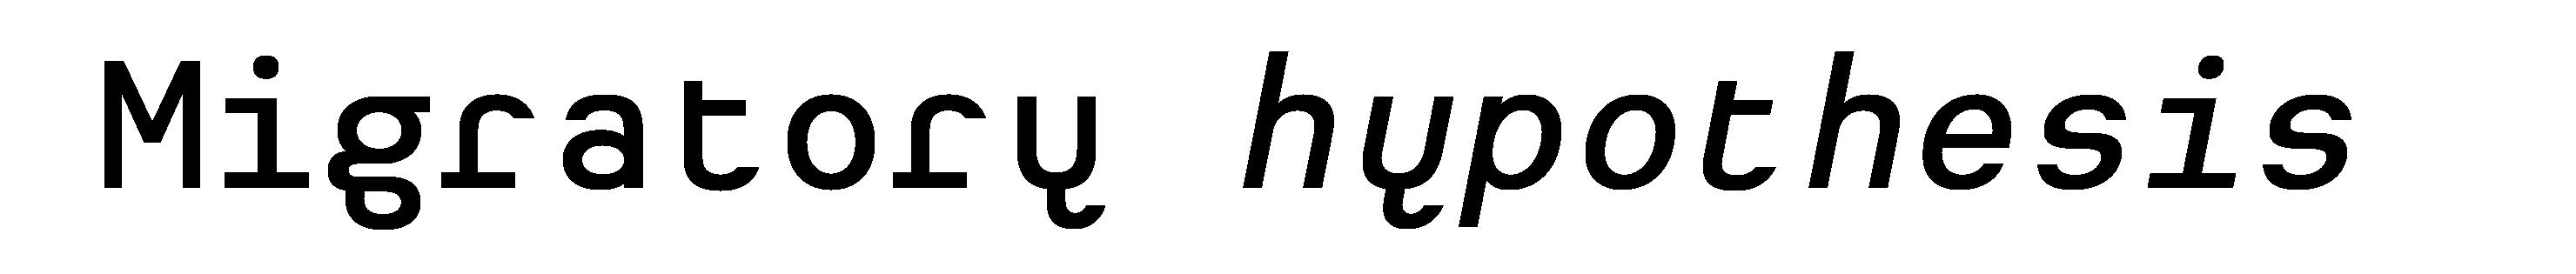 Typeface Heimat Mono D04 Atlas Font Foundry